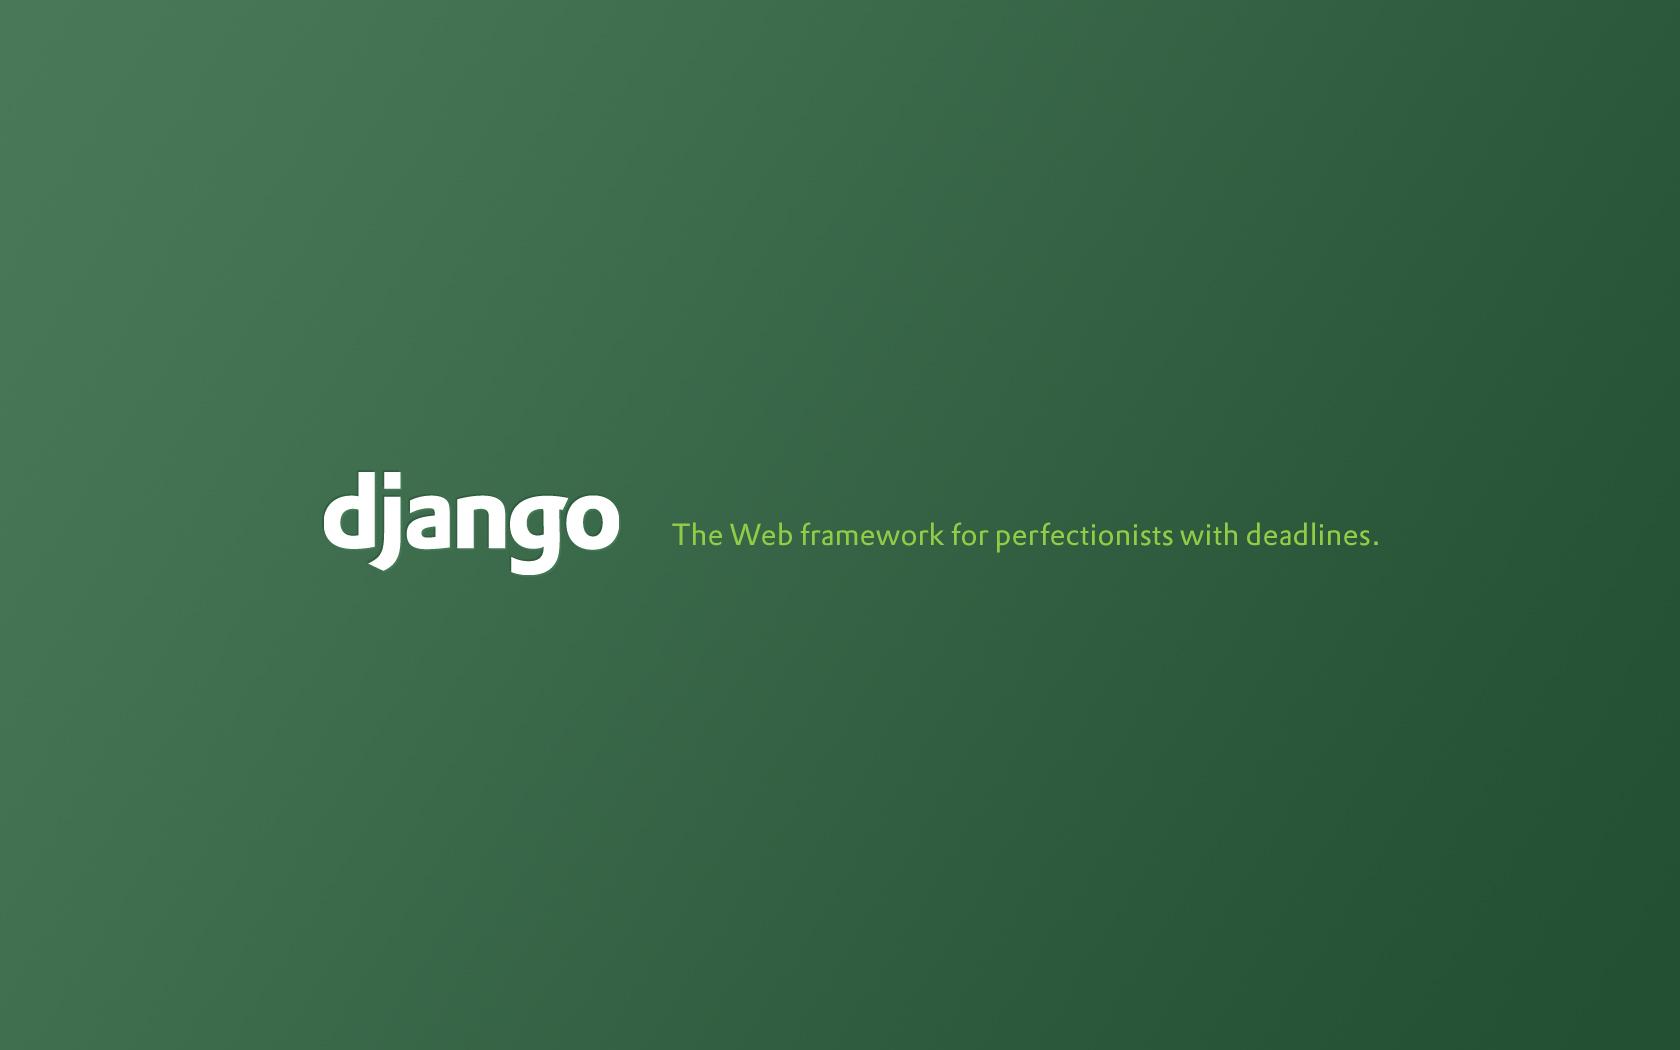 Ep 06. 和 the5fire 来聊聊 Django